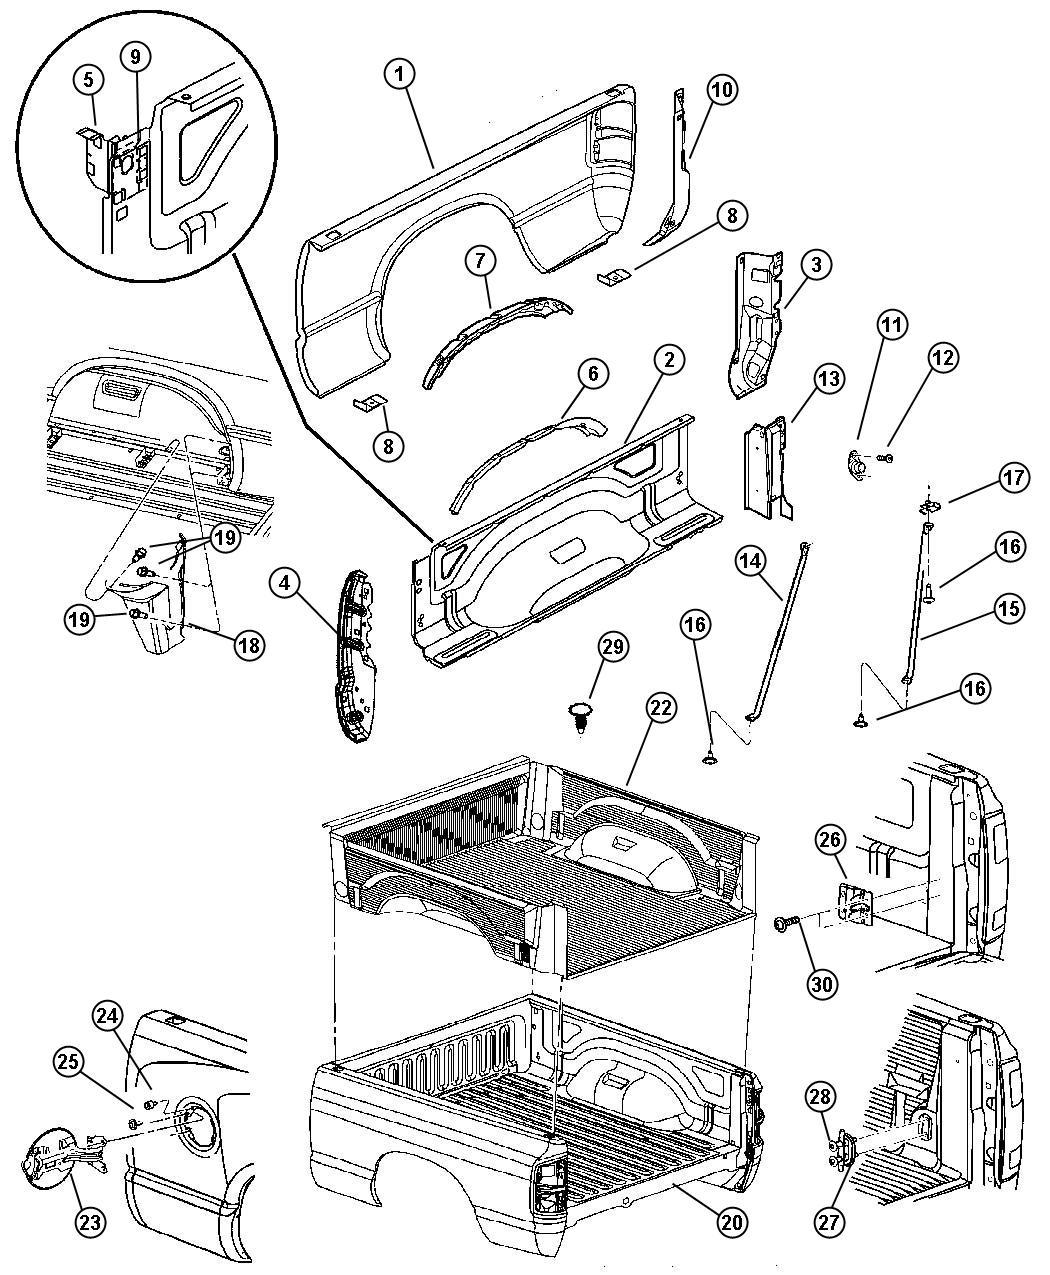 Dodge Ram 2500 Bedliner kit. Under rail. 6.5 foot